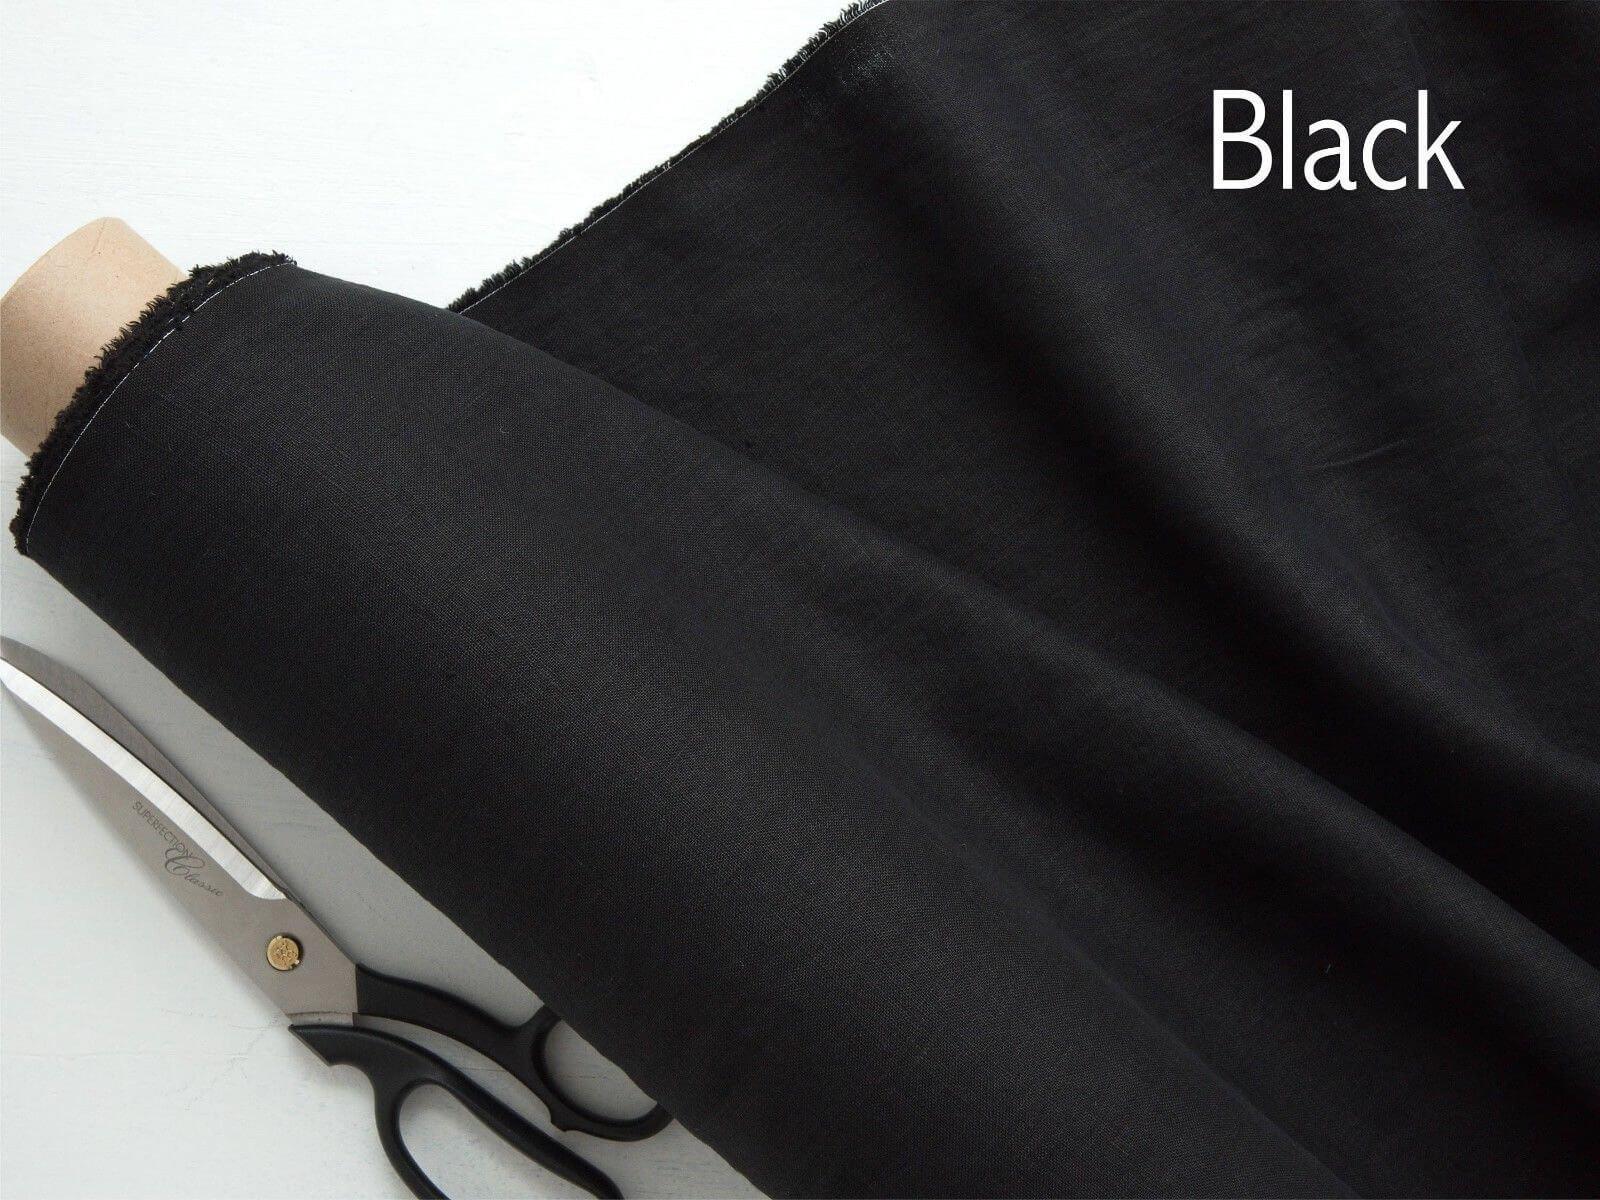 soft-linen-fabric-material-100-linens-textile-for-home-decor-curtains-clothes-140cm-wide-plain-black-5d73eee41.jpg